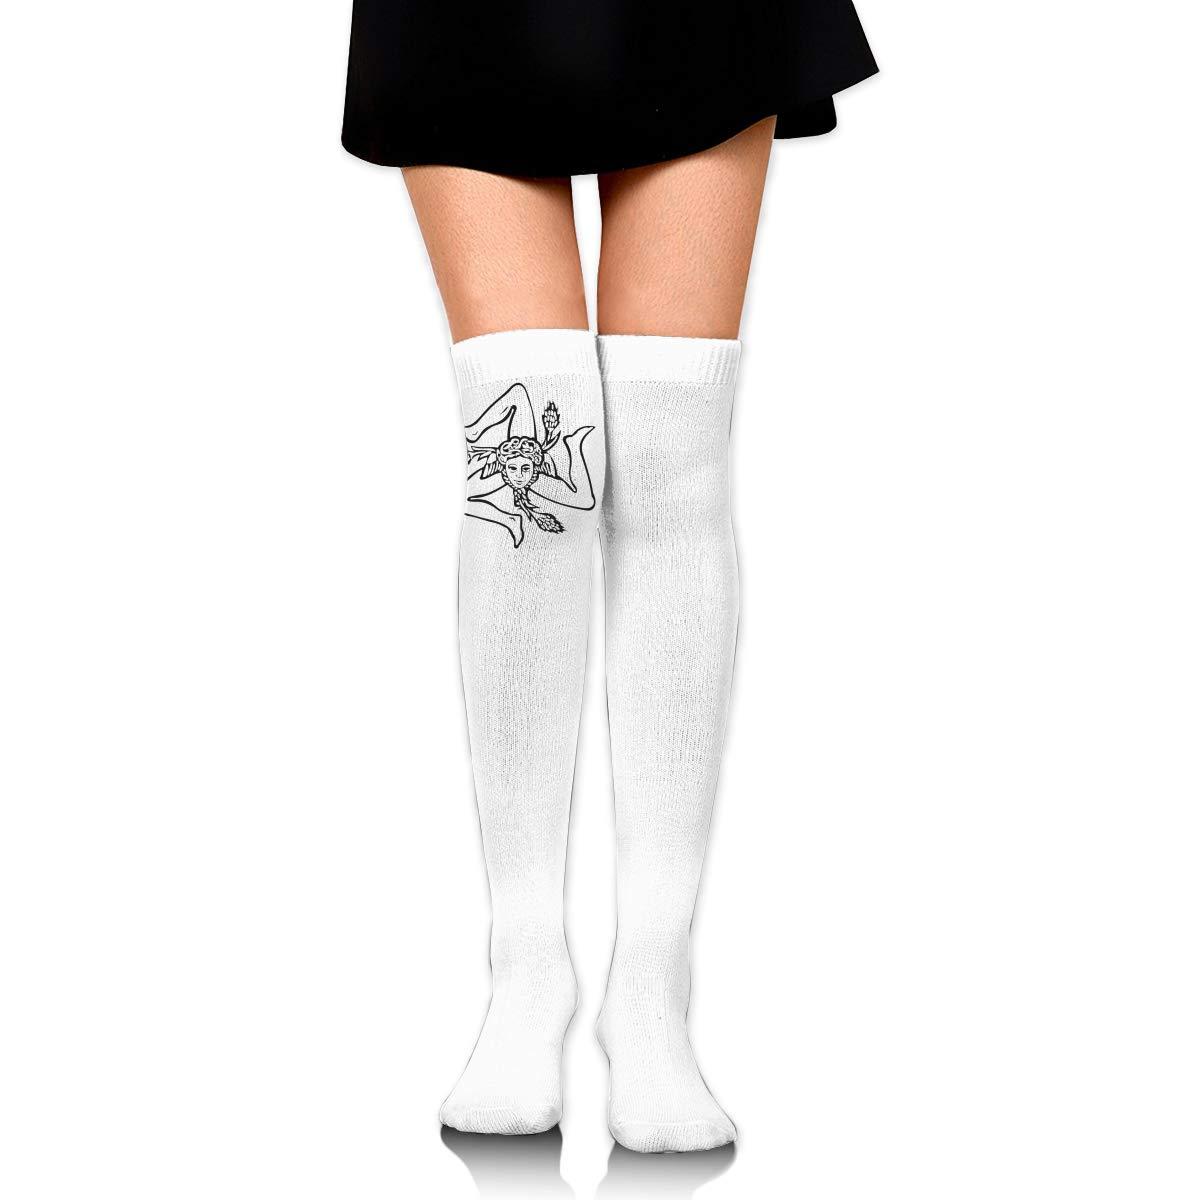 Sicilian Trinacria Logo Long Tight Thigh High Socks Over The Knee High Boot Stockings Leg Warmers